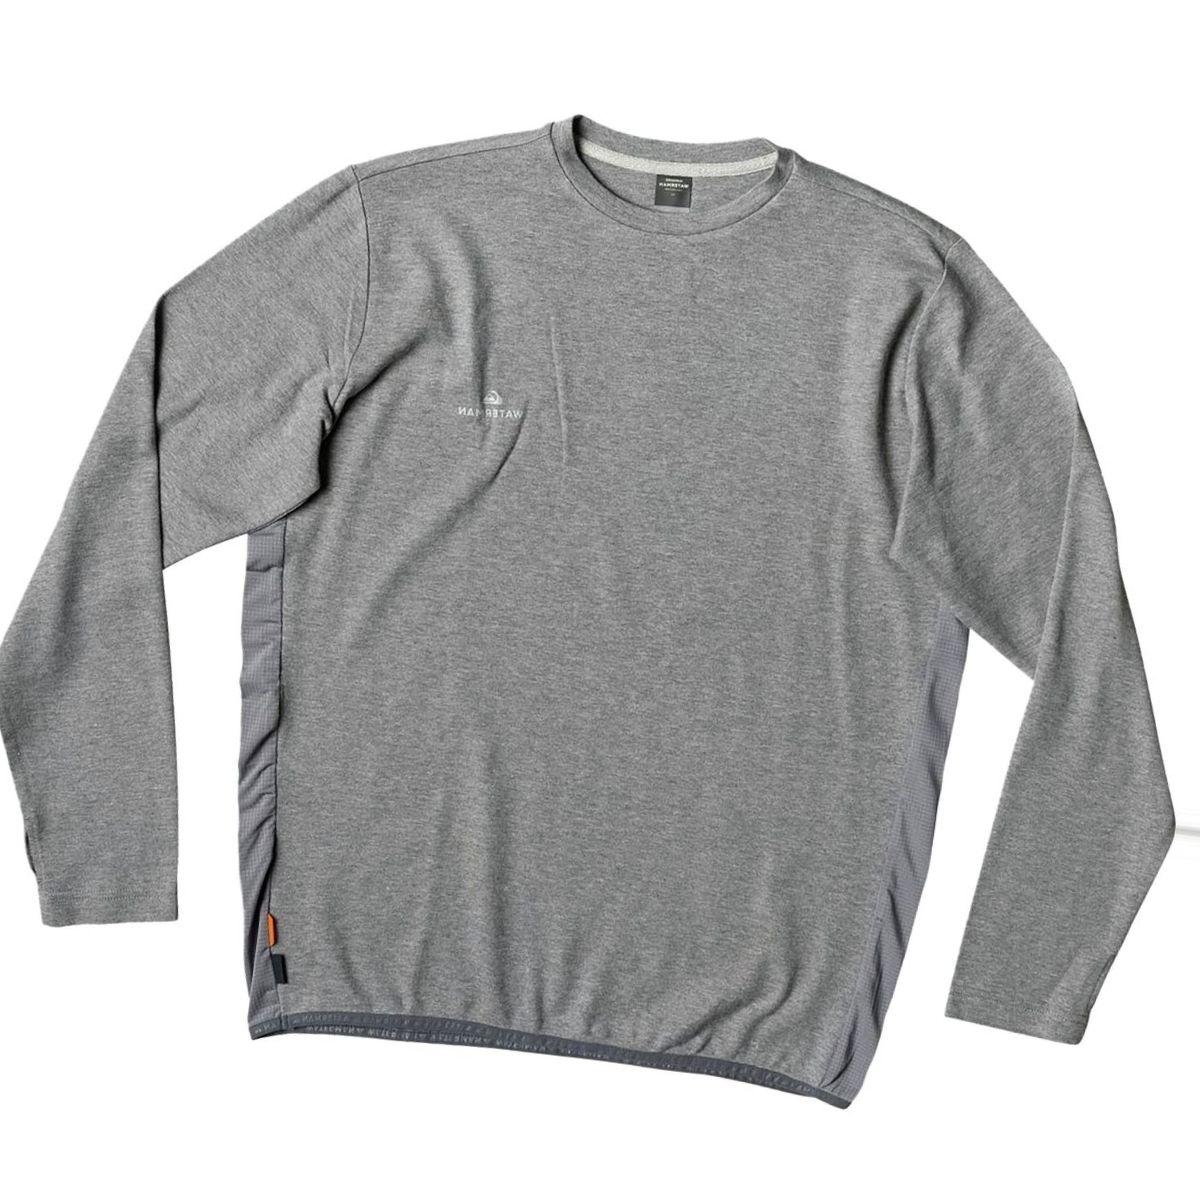 Quiksilver Waterman Sea Hound Long-Sleeve Crew Shirt - Men's